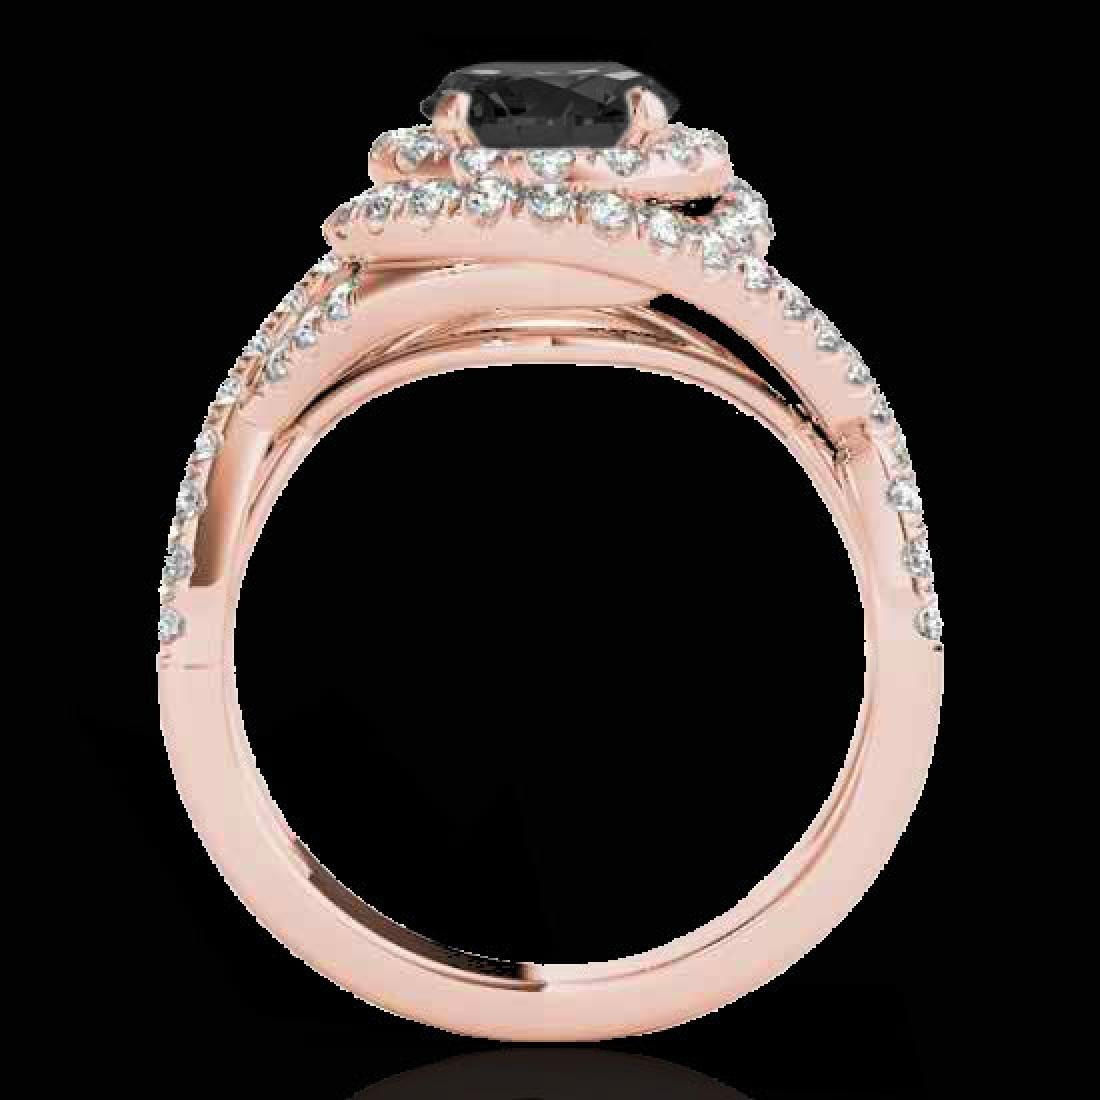 1.75 CTW Certified VS Black Diamond Solitaire Halo Ring - 2